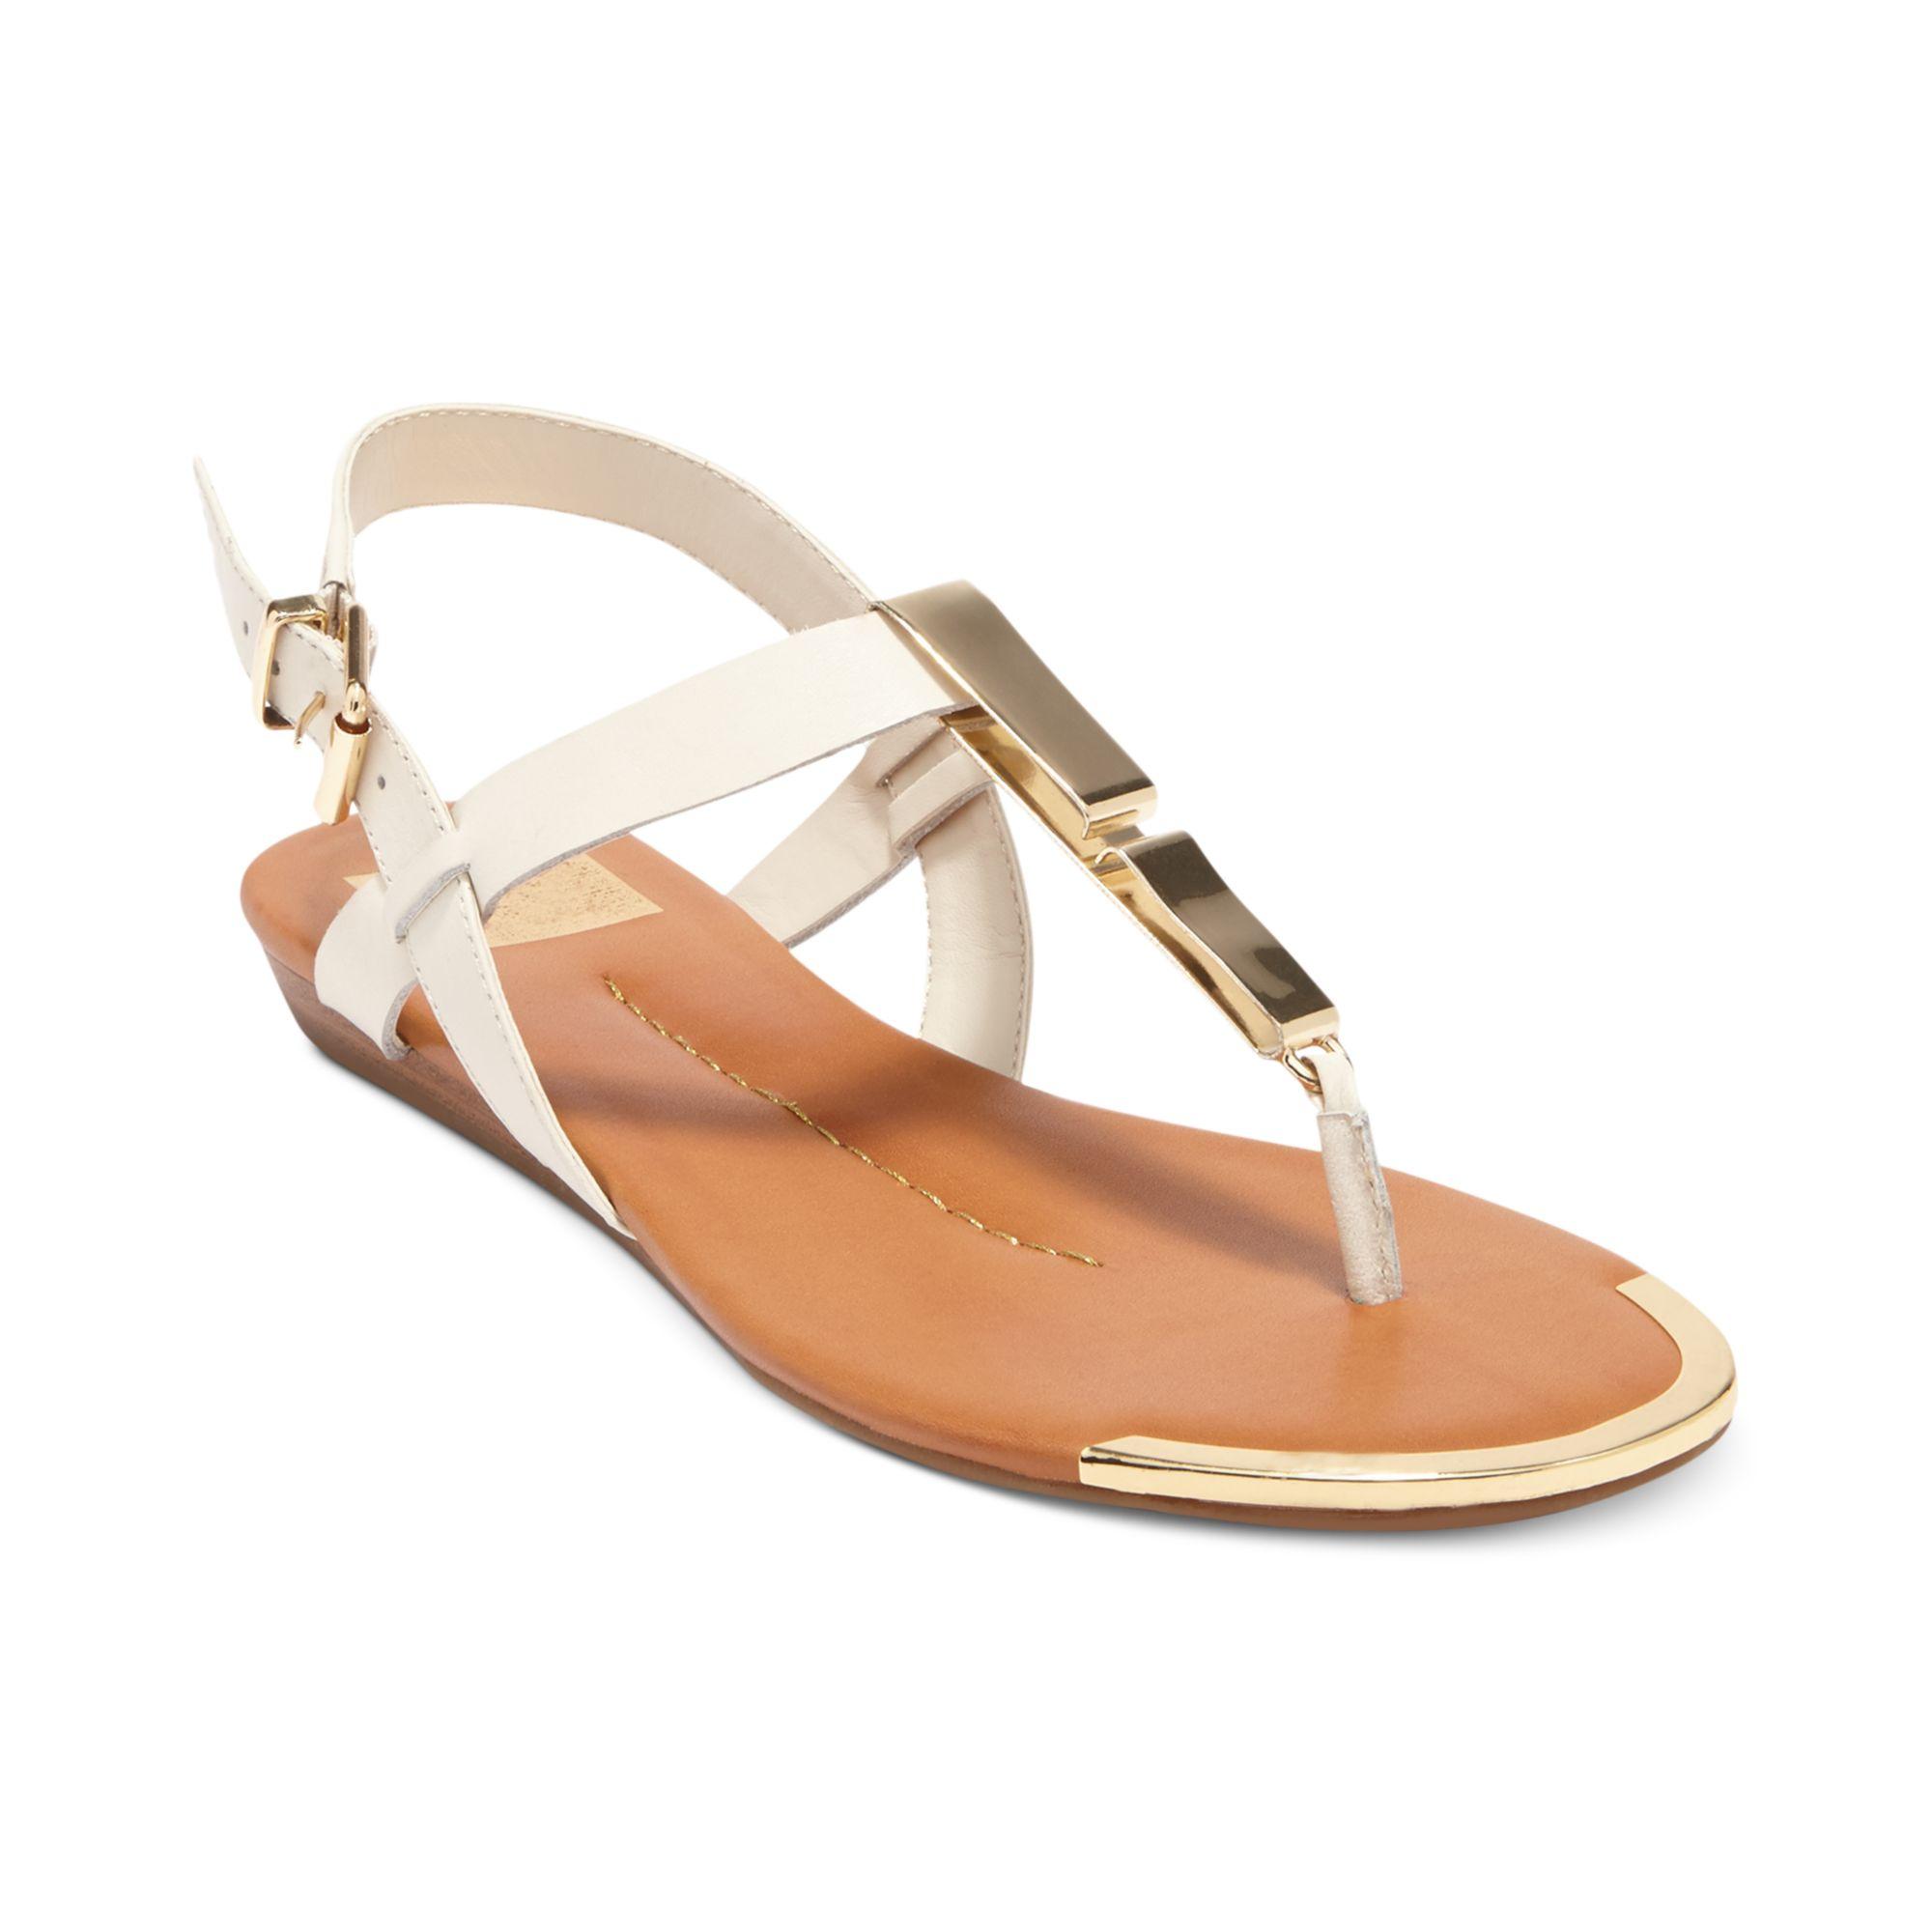 31f7b7b24 Lyst dolce vita abley flat thong sandals in white jpg 2000x2000 Dv sandals